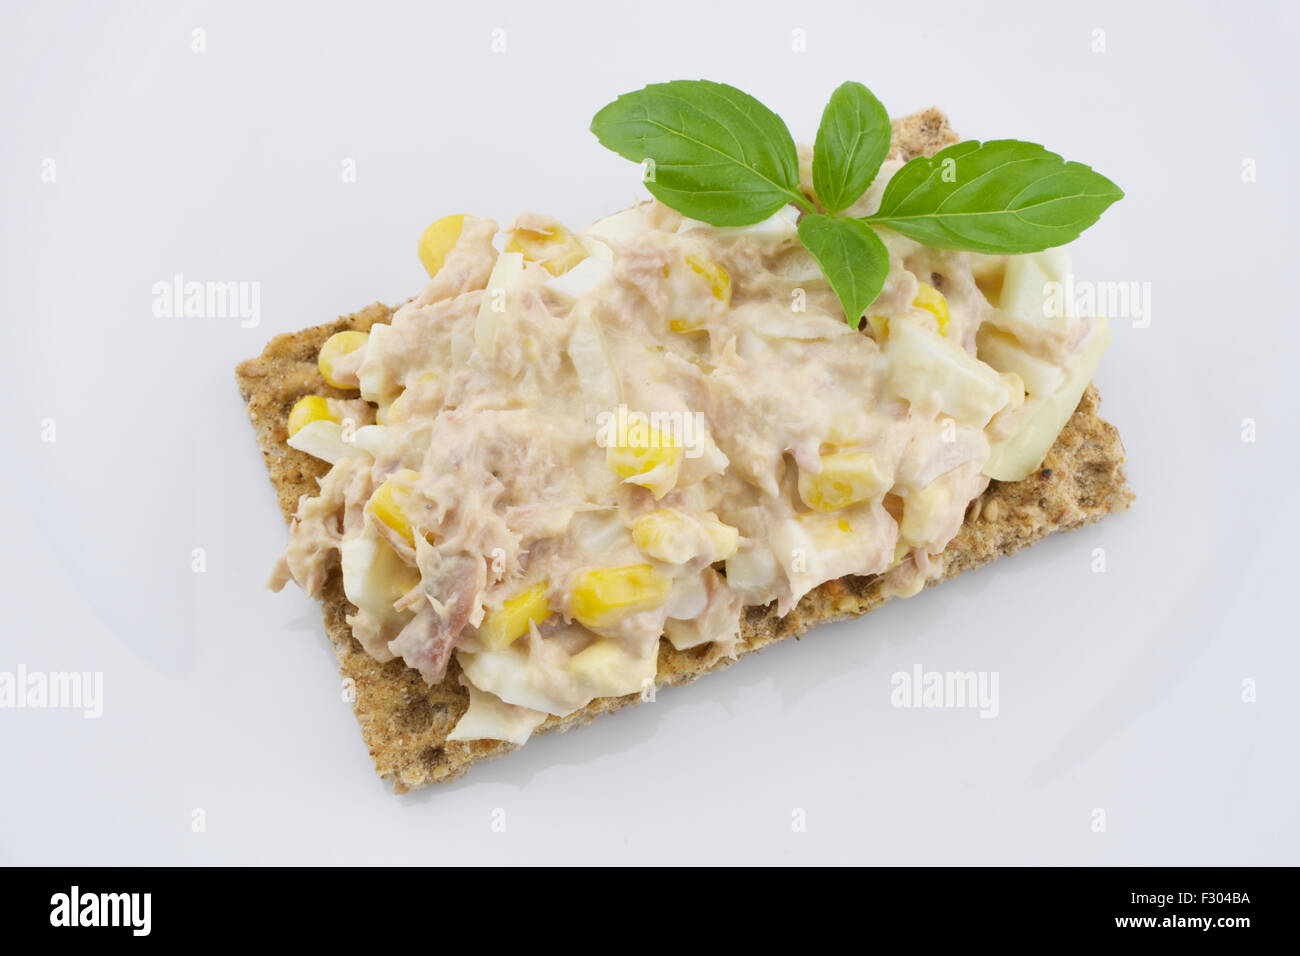 Multigrain crisp bread and tuna salad Stock Photo